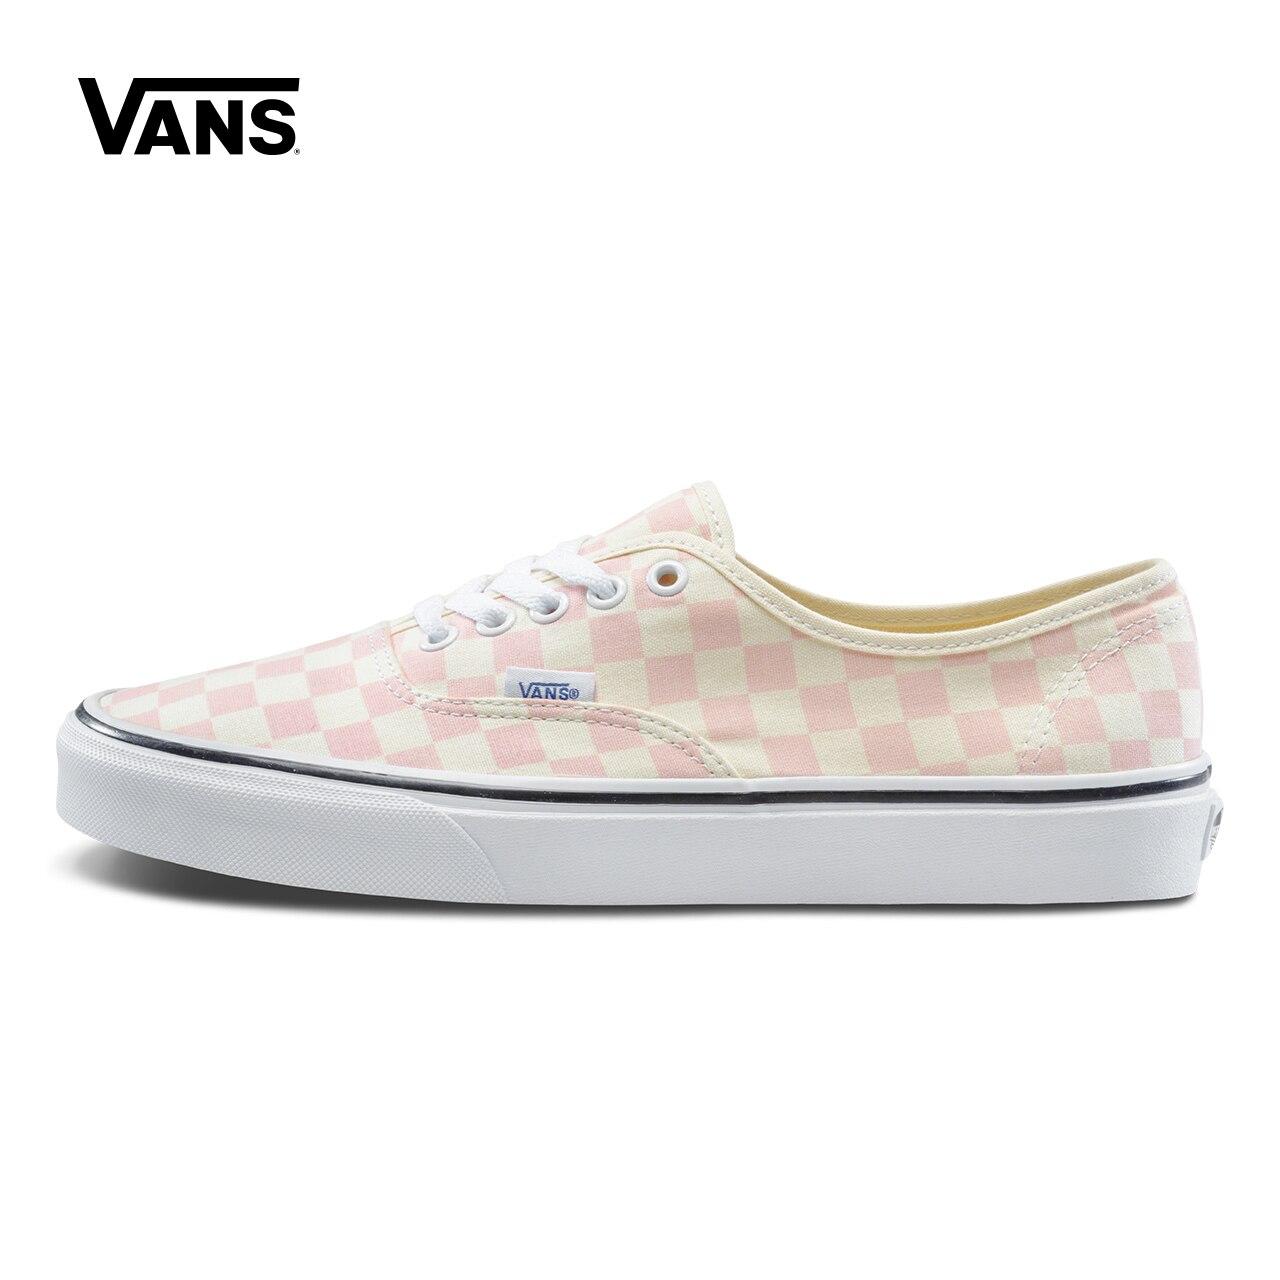 Pink Grid Vans Shoes Women Authentic Low-top Skateboarding Shoes Sneakers Sport Outdoor Classic Canvas Sneaker VN0A38EMQ8L unisex vans shoes white letter printed low top skateboarding shoes sneakers sport outdoor canvas vans sneaker vn0a3qxzt1z